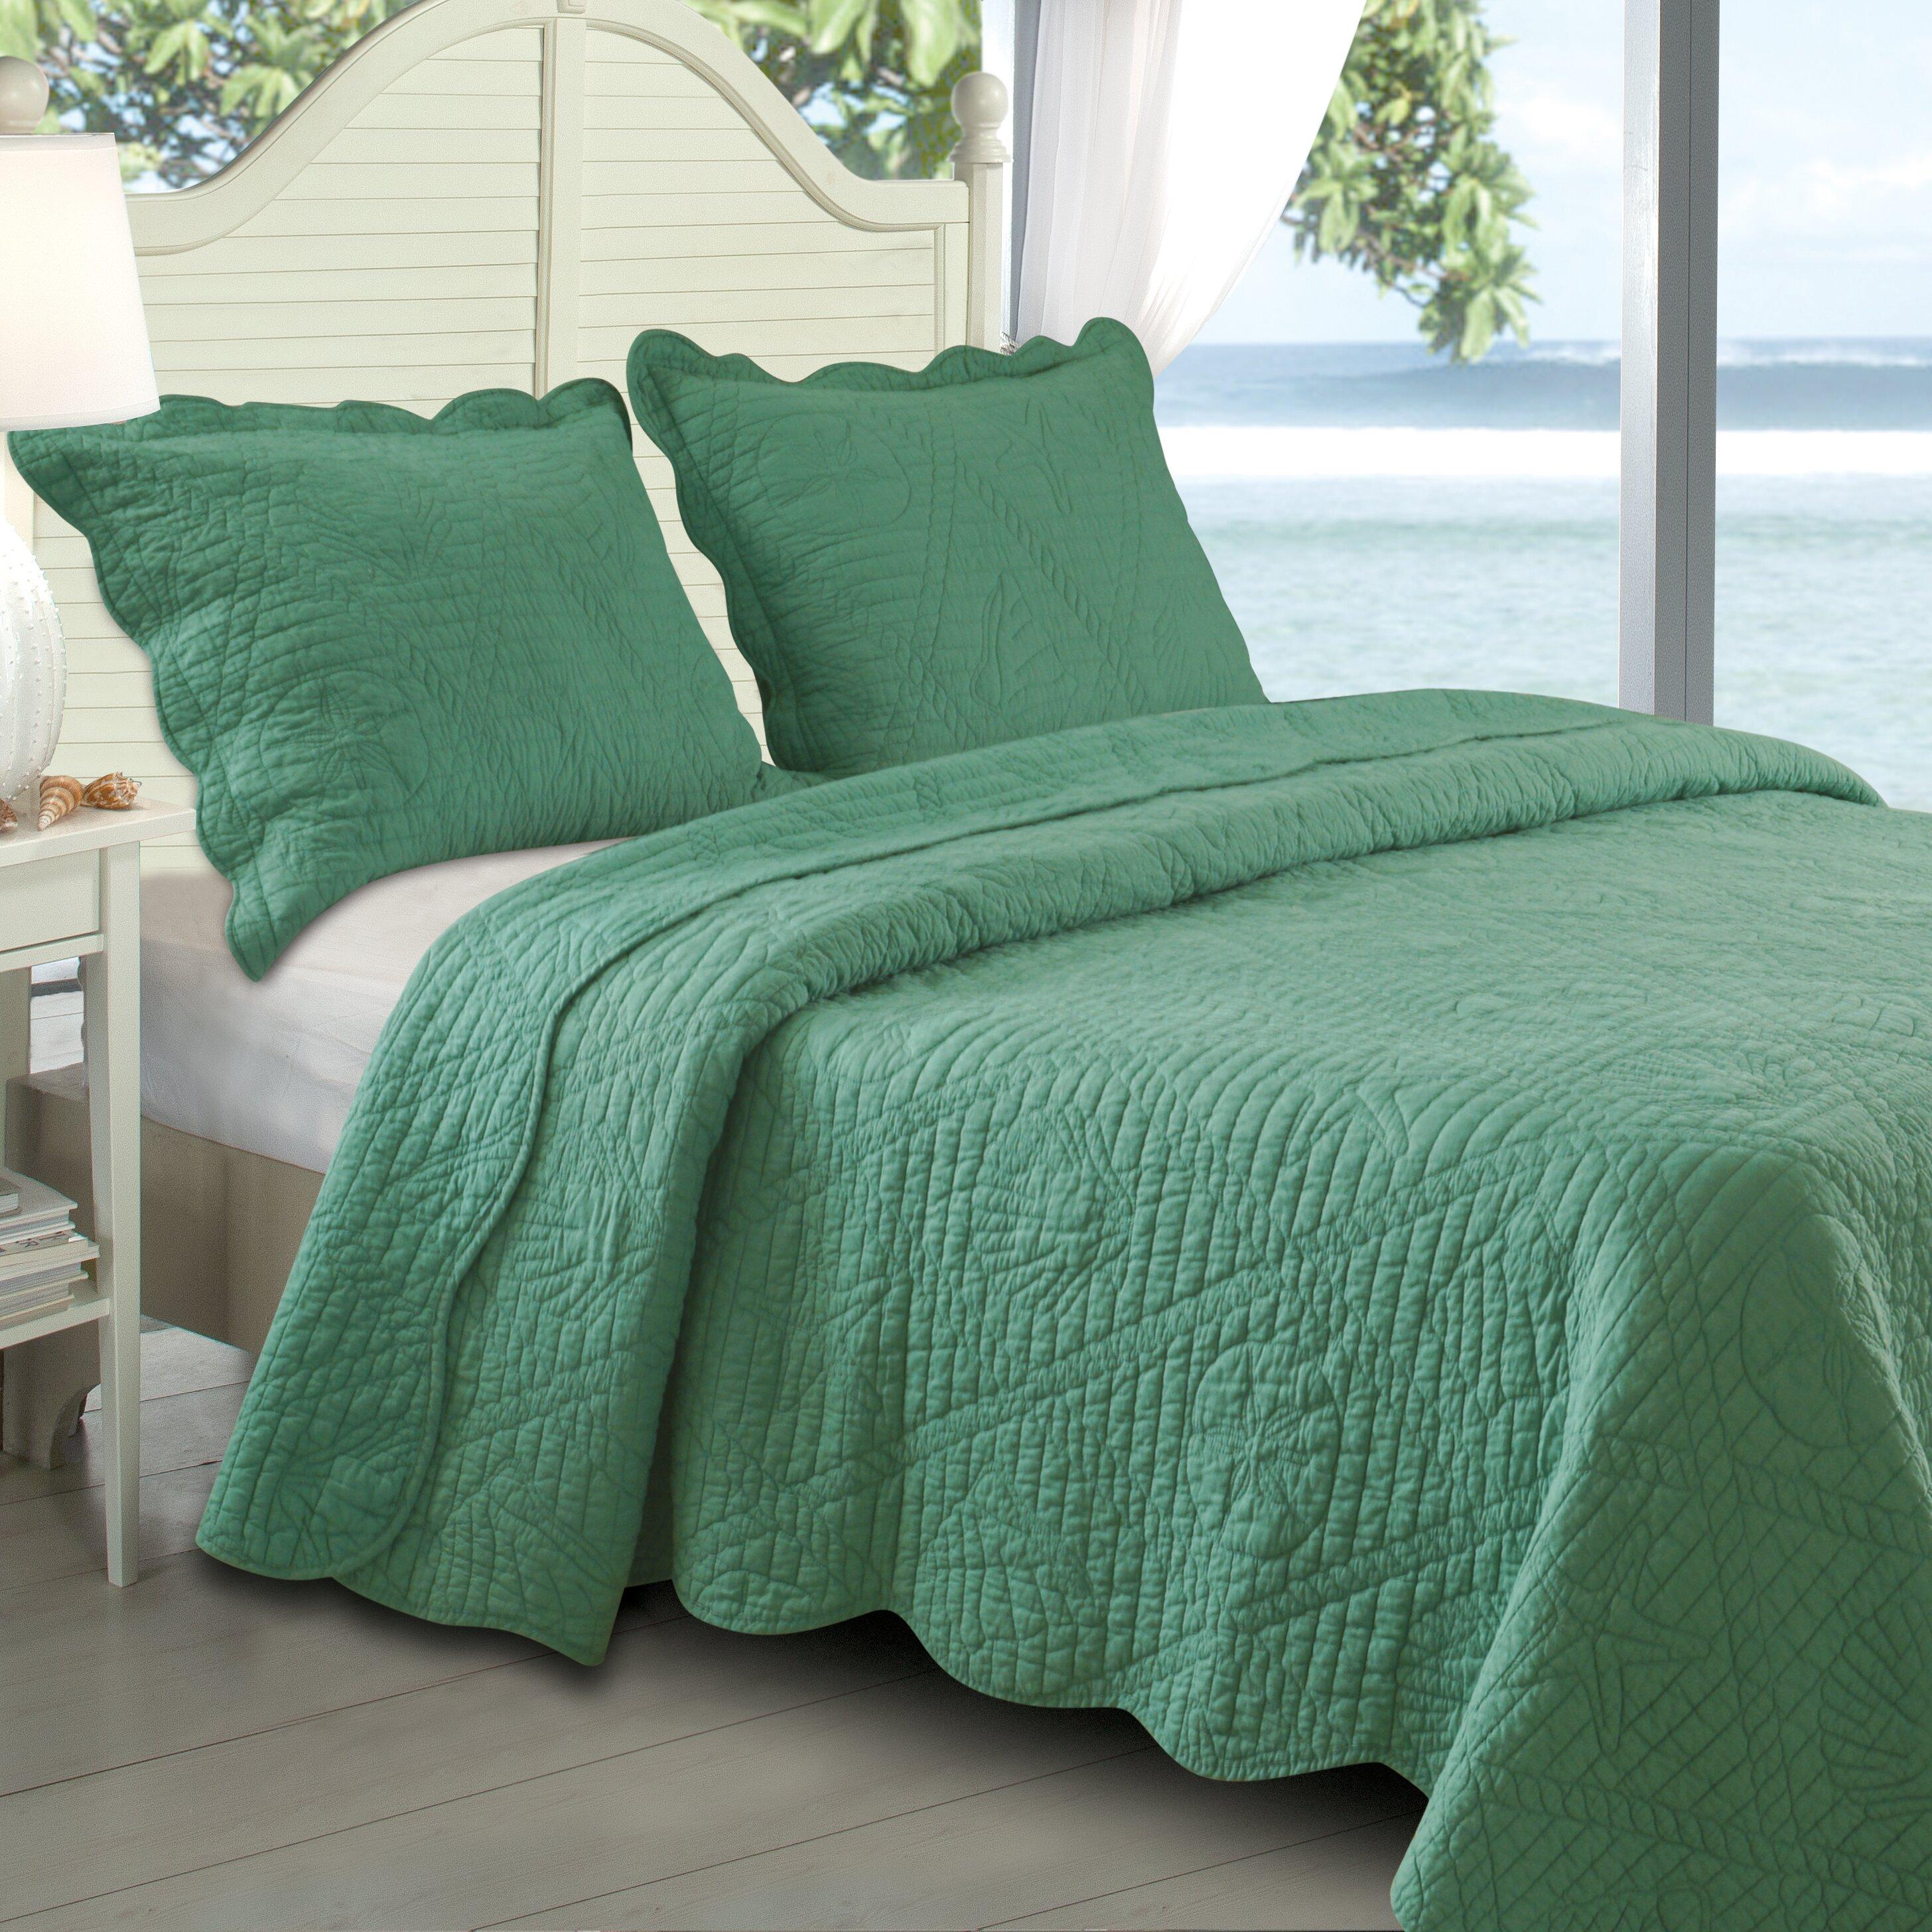 Greenland Home Fashions La Jolla Seashell Quilt Set